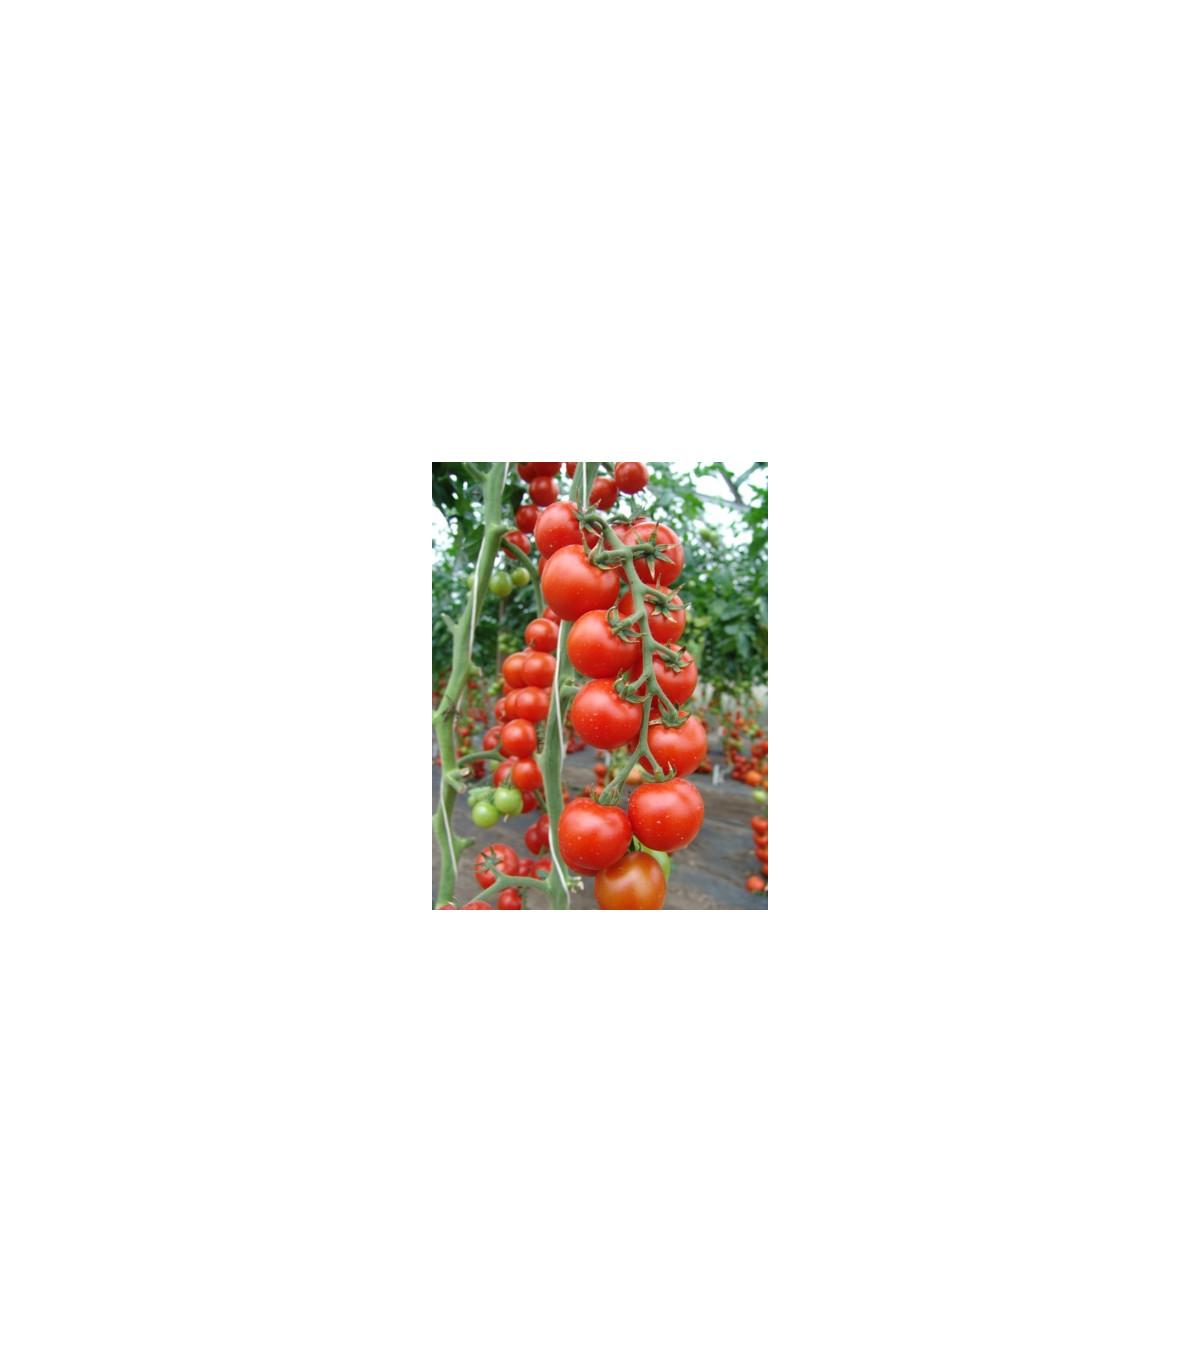 Rajče Spencer - Lycopersicon lycopersicum - osivo rajčat - 20 ks